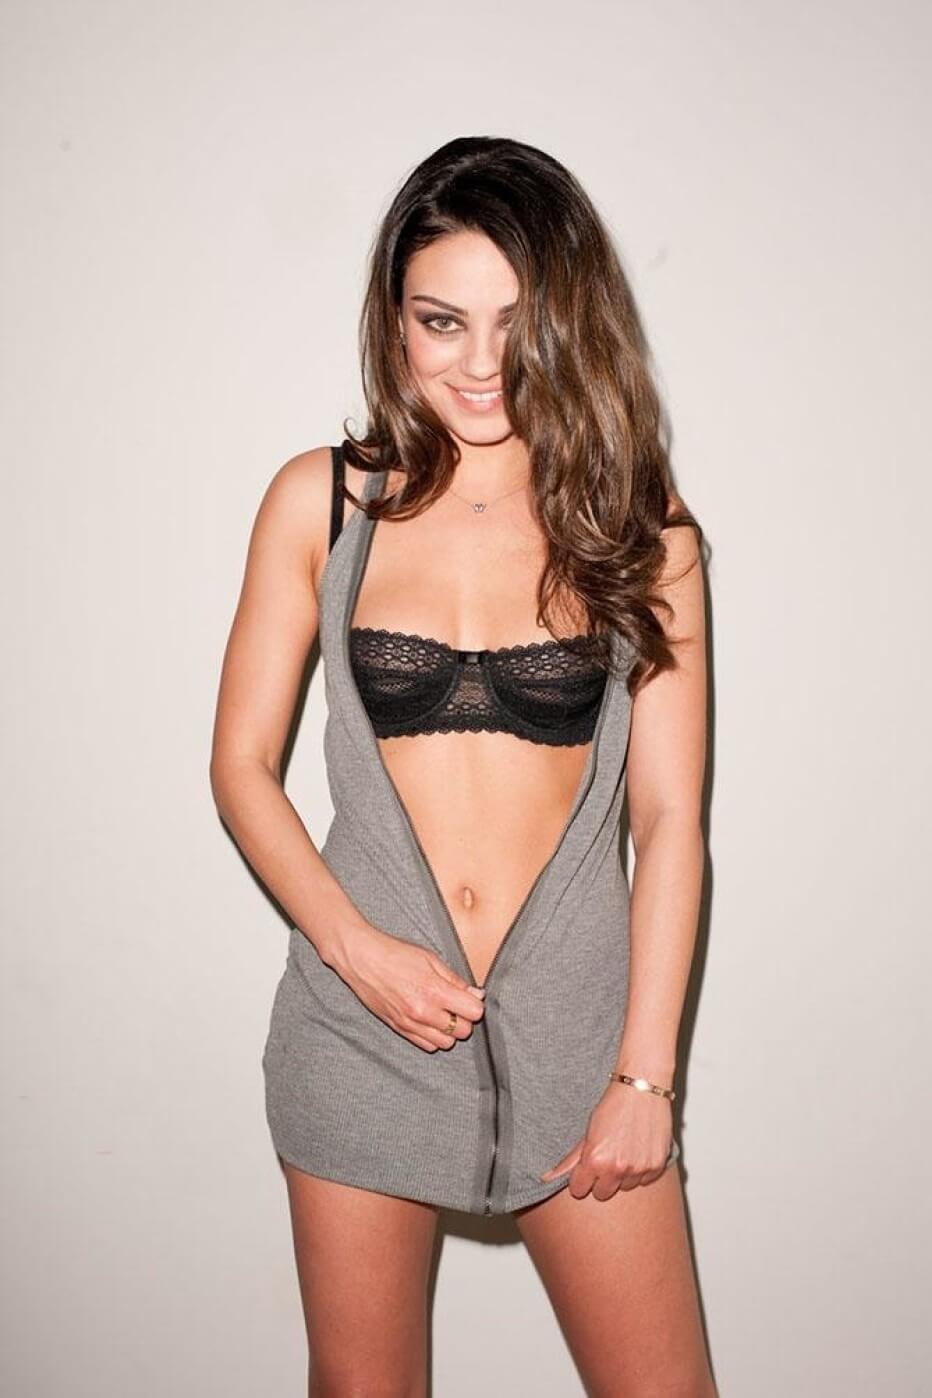 50 Hot And Sexy Mila Kunis Photos - 12thBlog